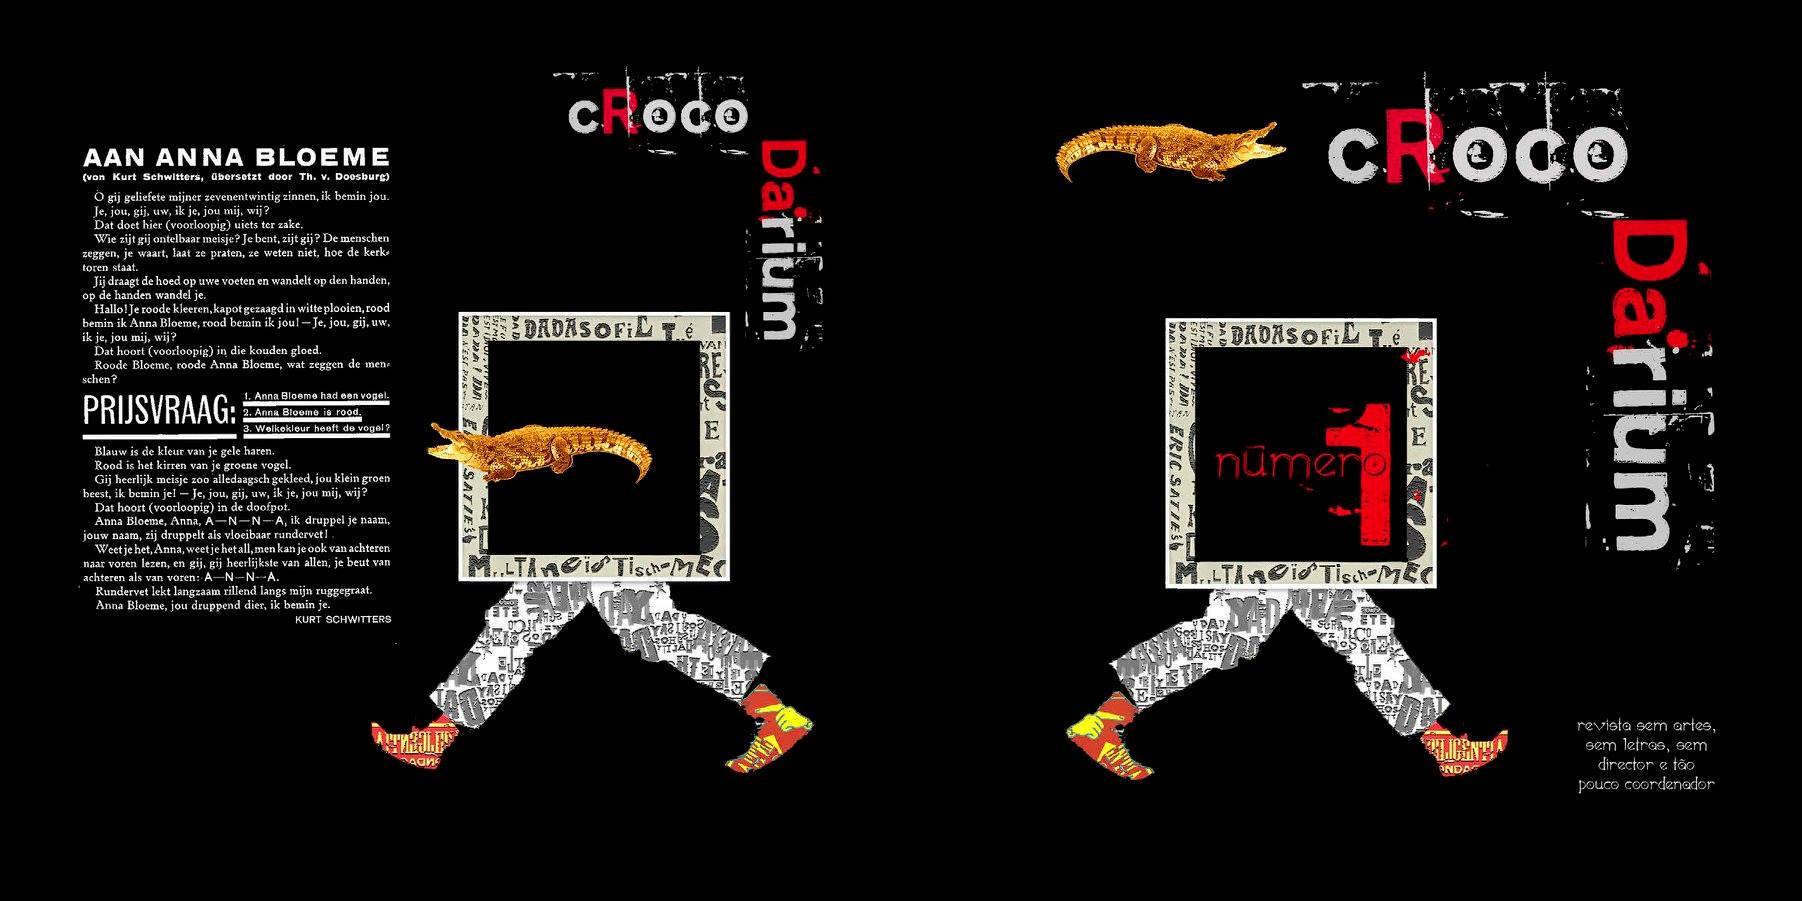 Crocodarium nº1